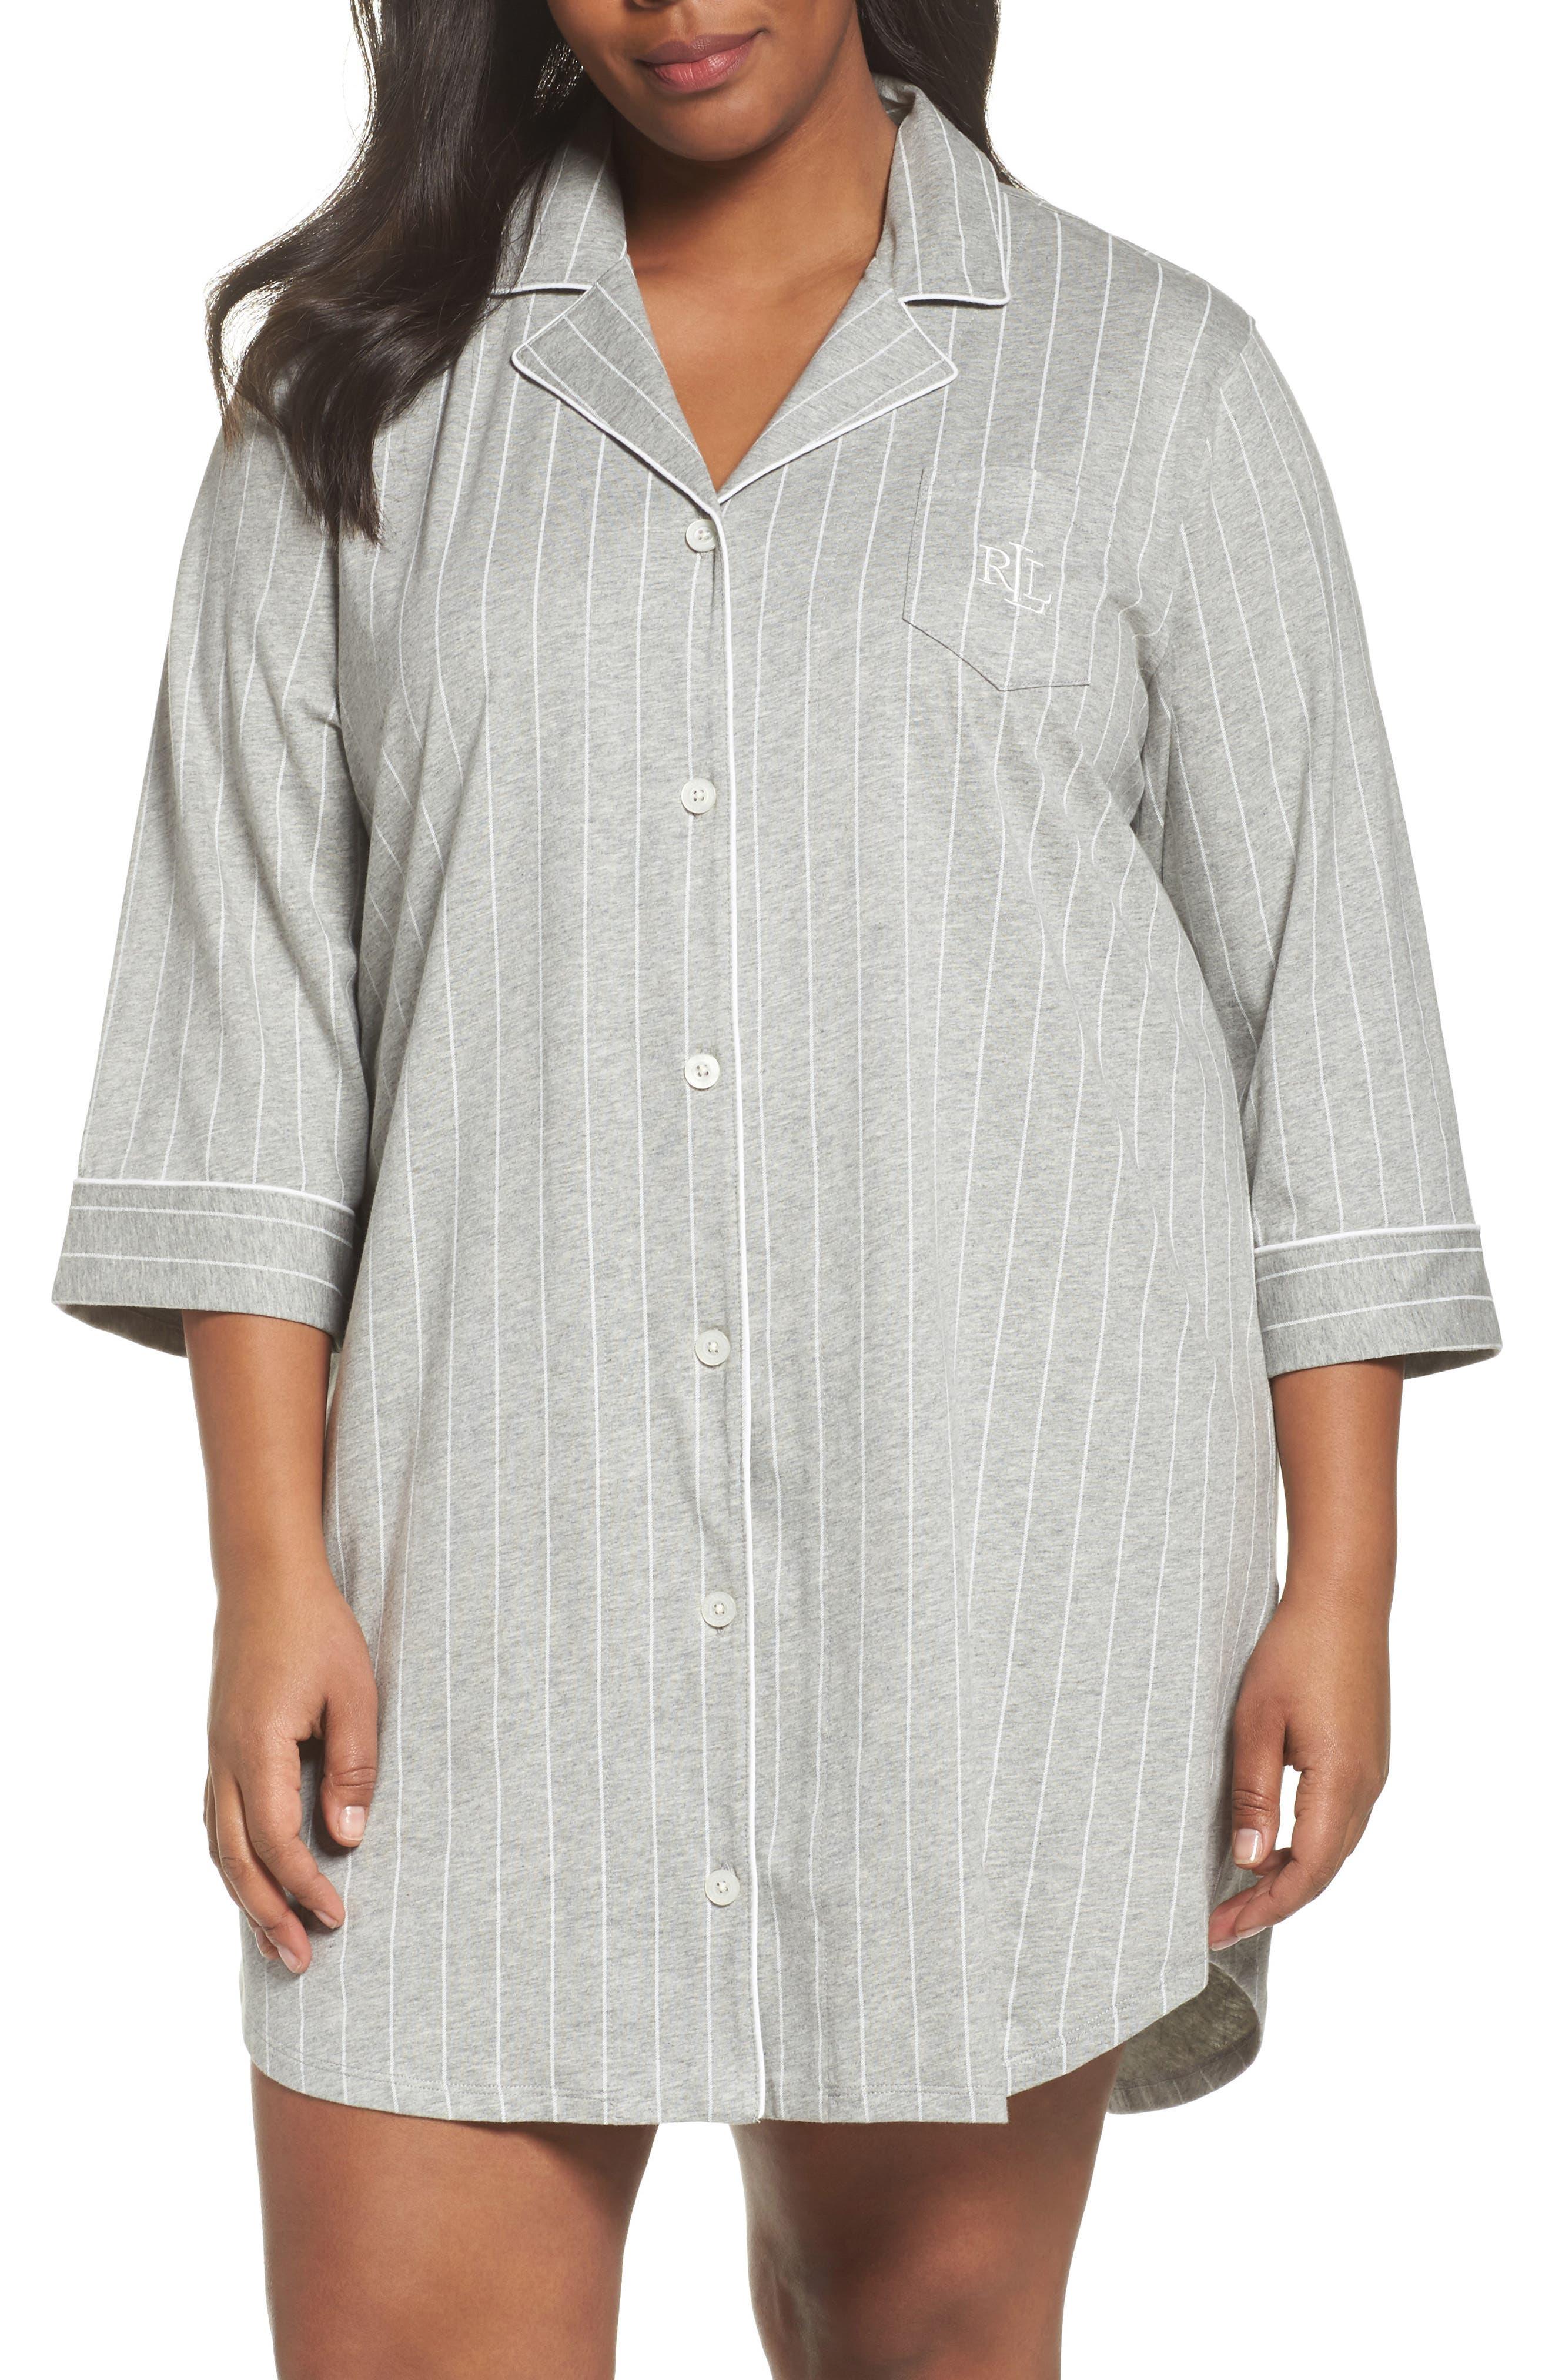 Main Image - Lauren Ralph Lauren Knit Jersey Sleep Shirt (Plus Size) (Online Only)